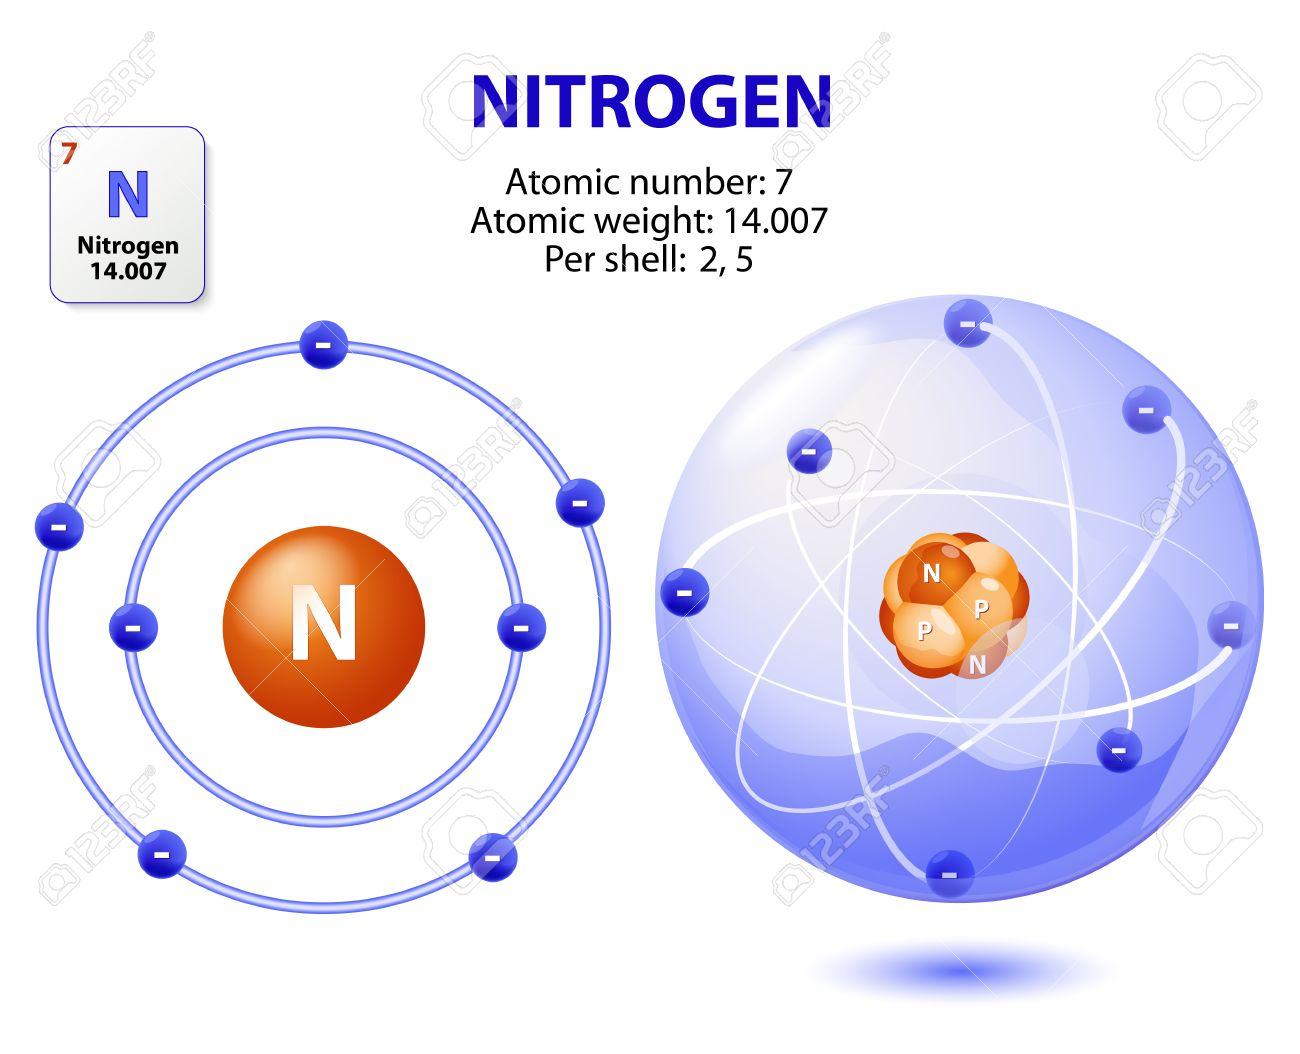 Atom nitrogen structure atom nitrogen vector royalty free cliparts atom nitrogen structure atom nitrogen vector stock vector 47337599 ccuart Image collections